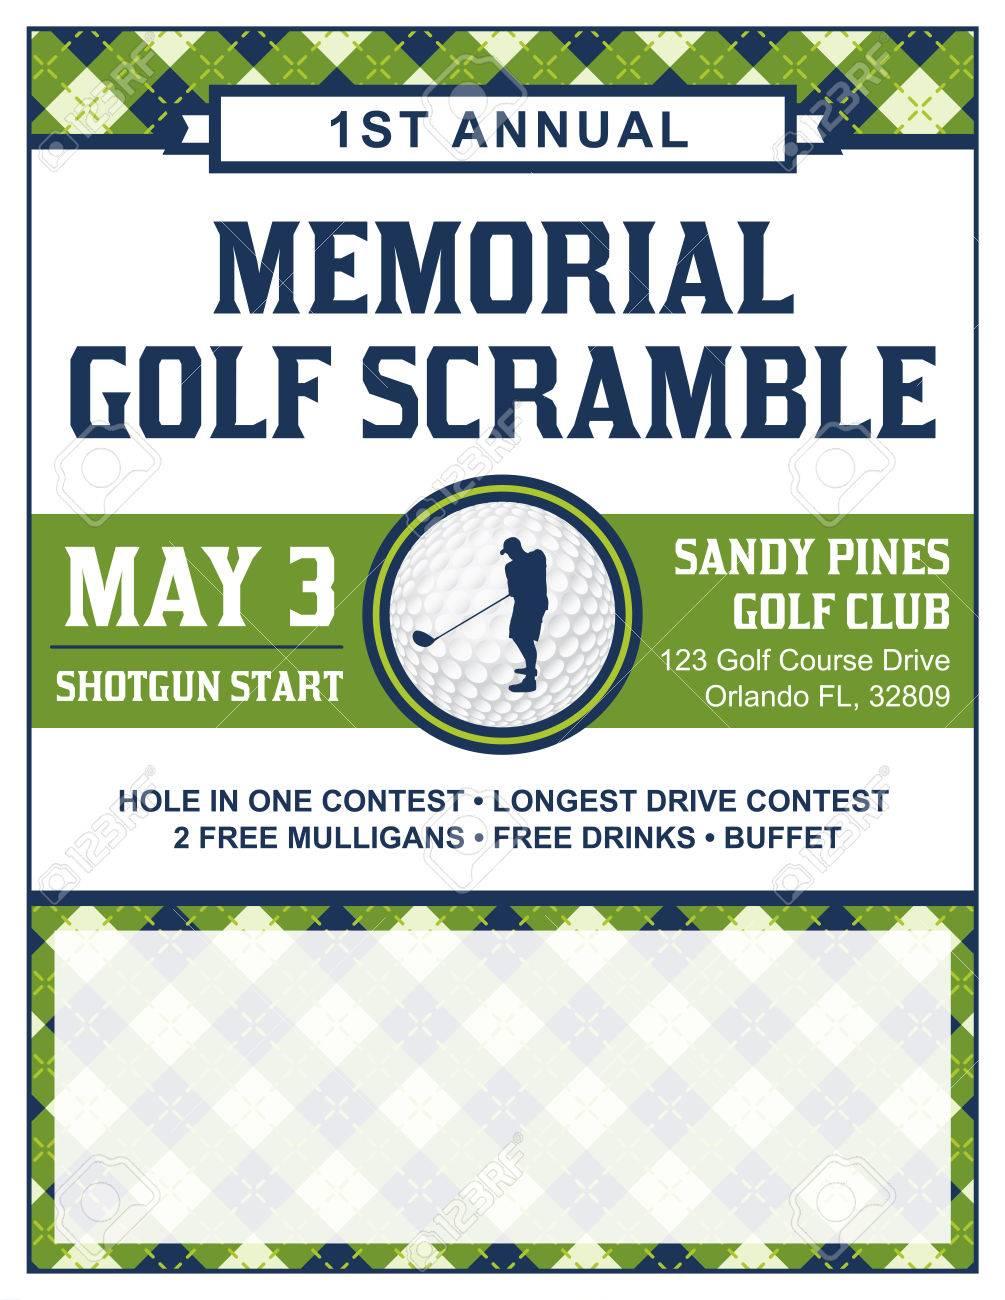 A template for a golf tournament scramble invitation flyer. - 56861232